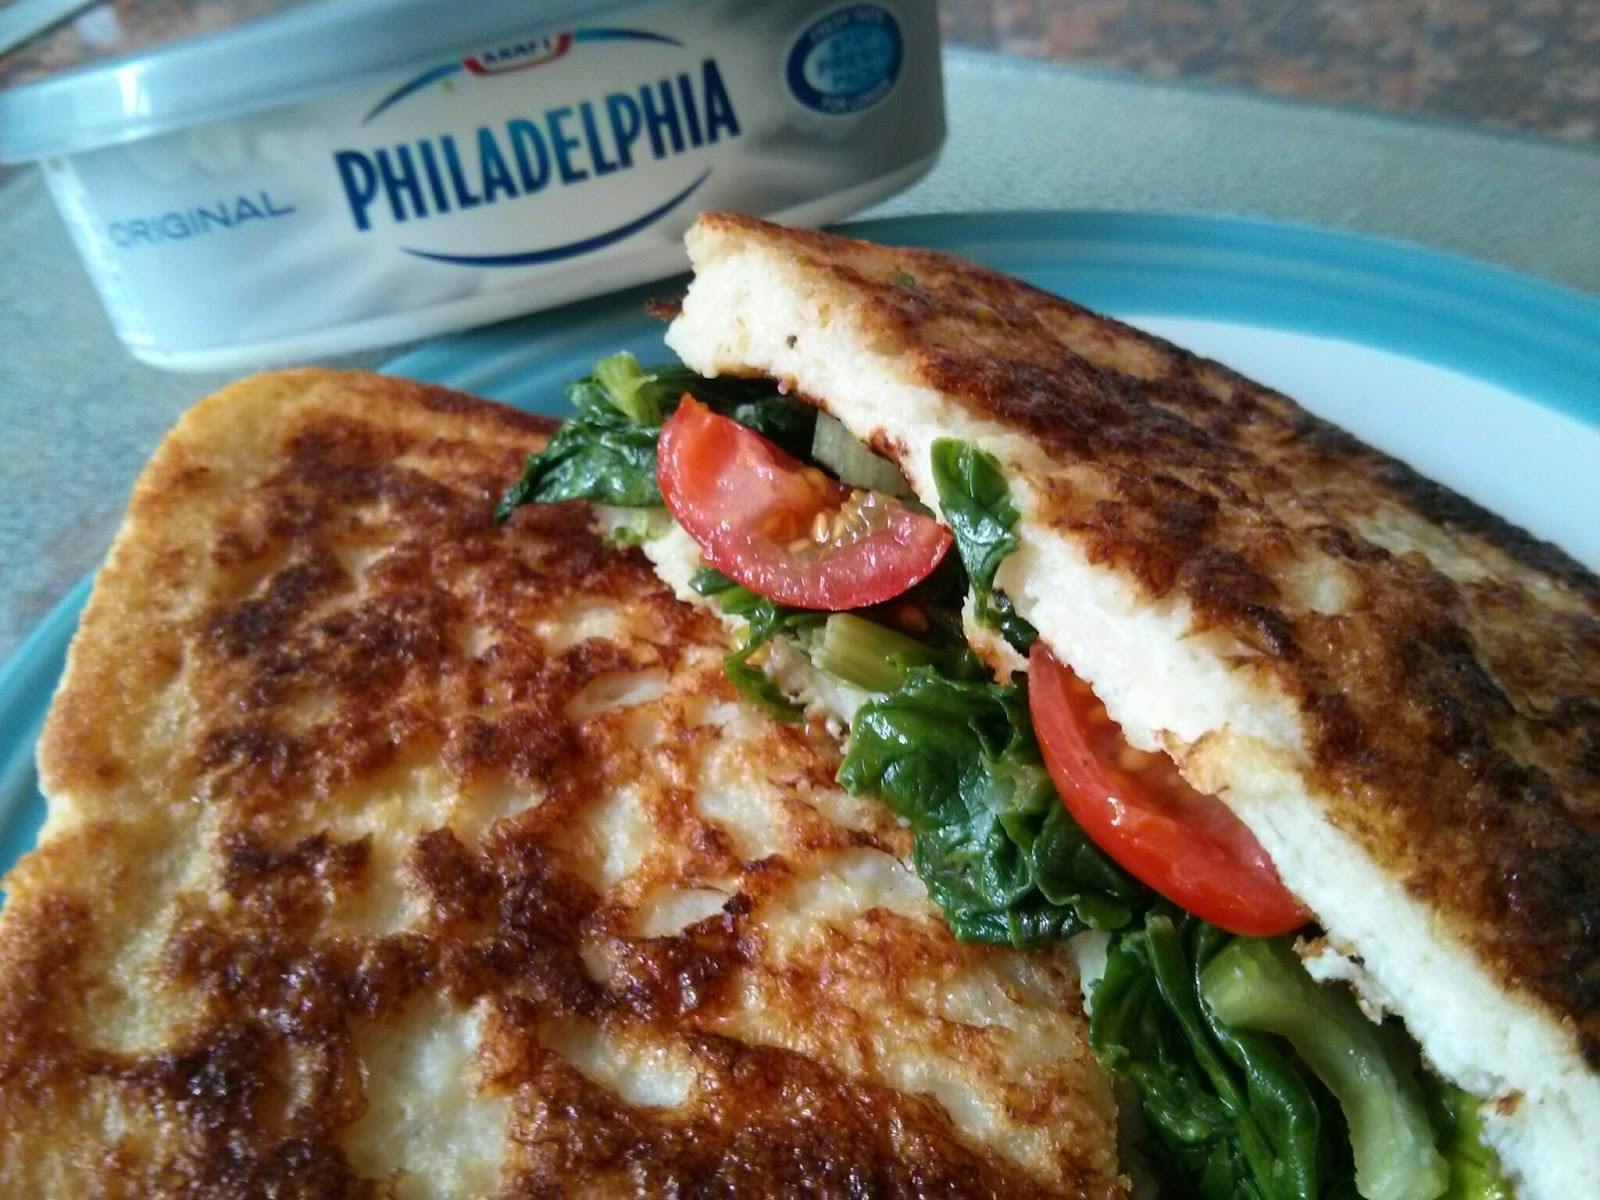 Millionaire's Spinach, Tomato and Philadelphia sandwich